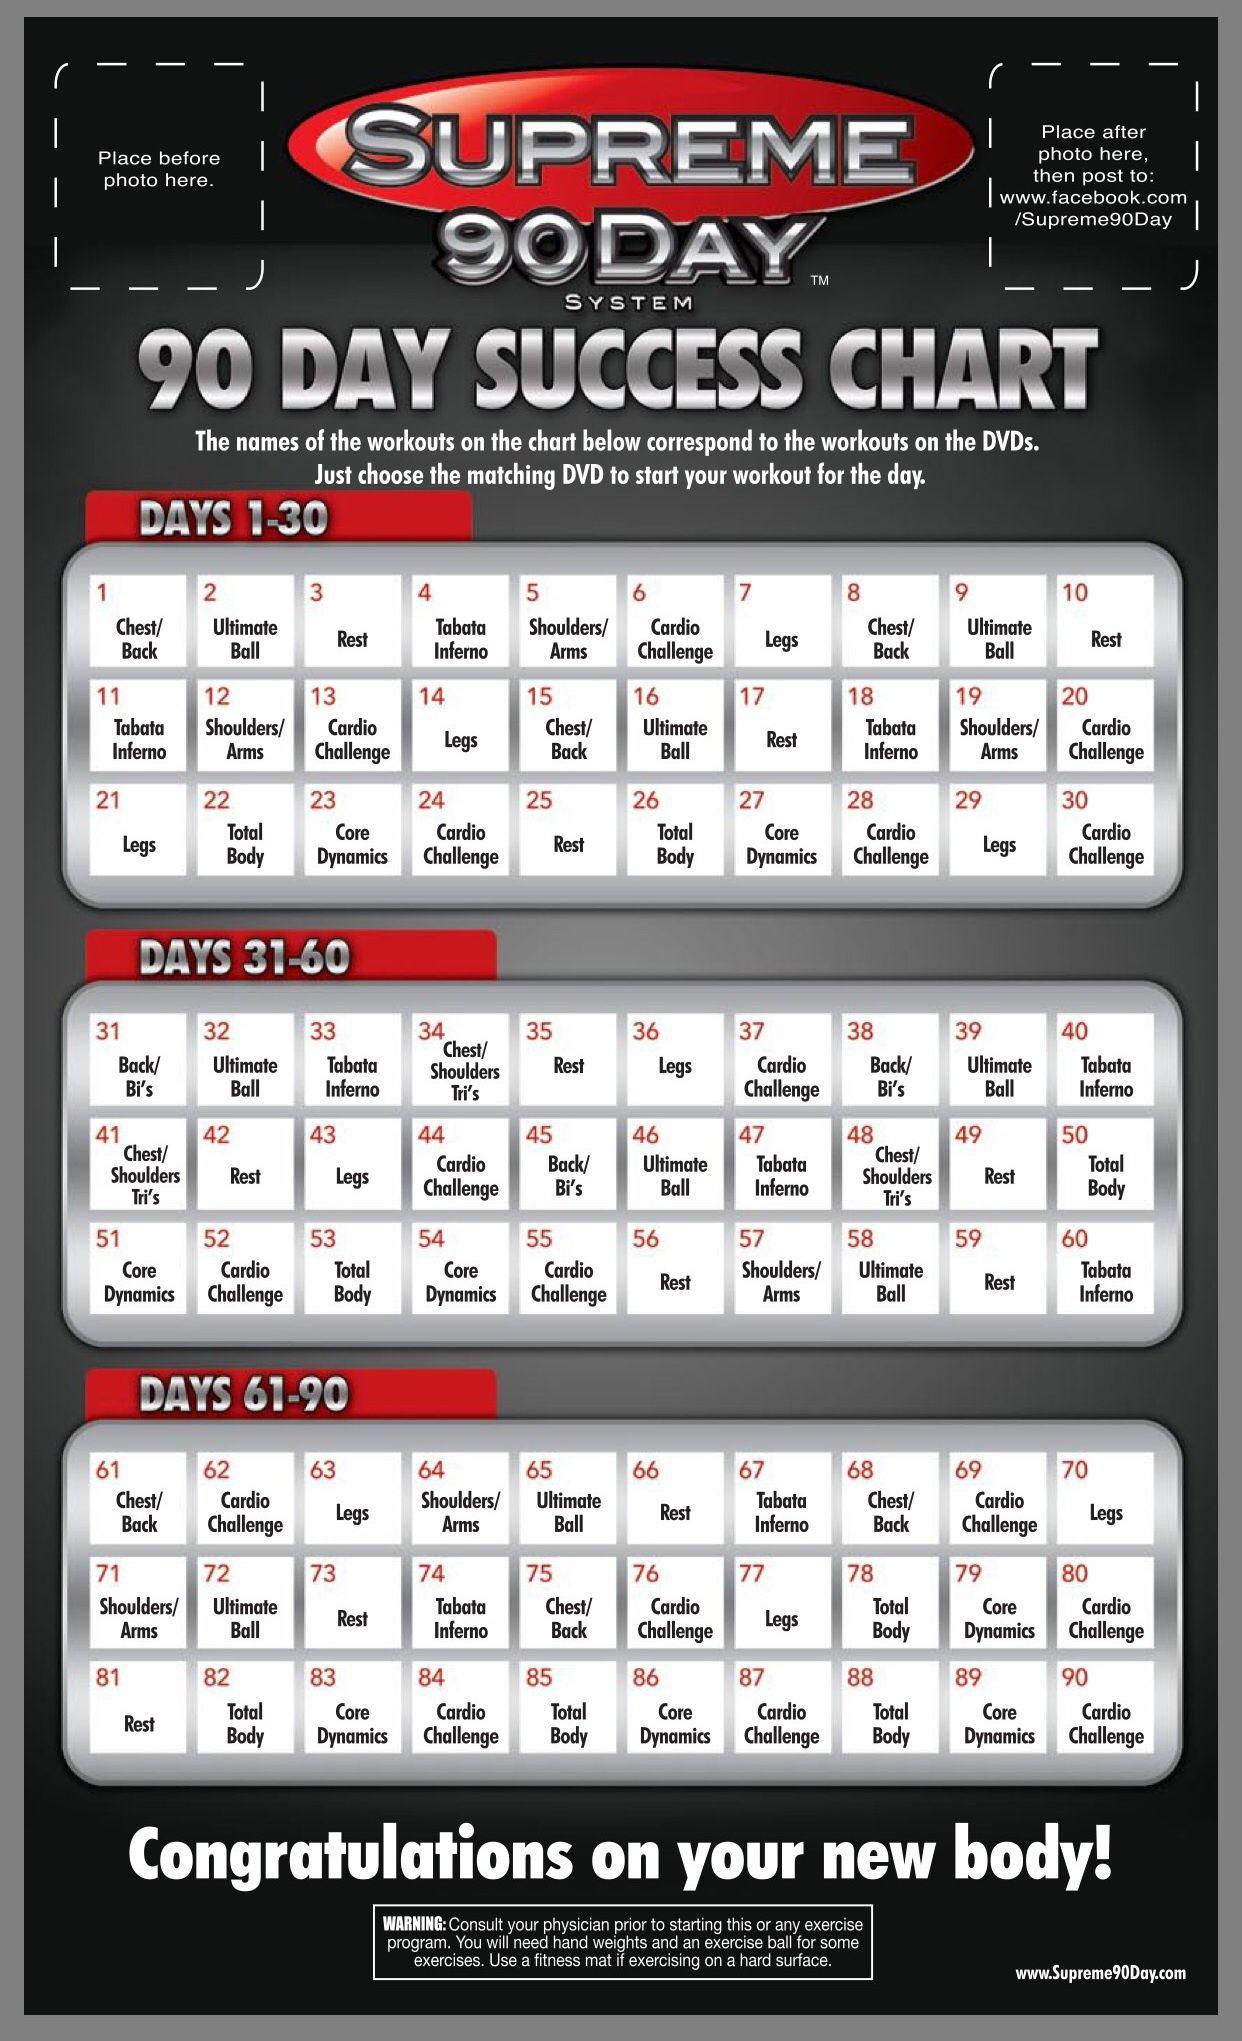 Supreme 90 Day Workout Calendar : supreme, workout, calendar, Supreme, System, Ideas, Ripped,, Nutrition, Guide,